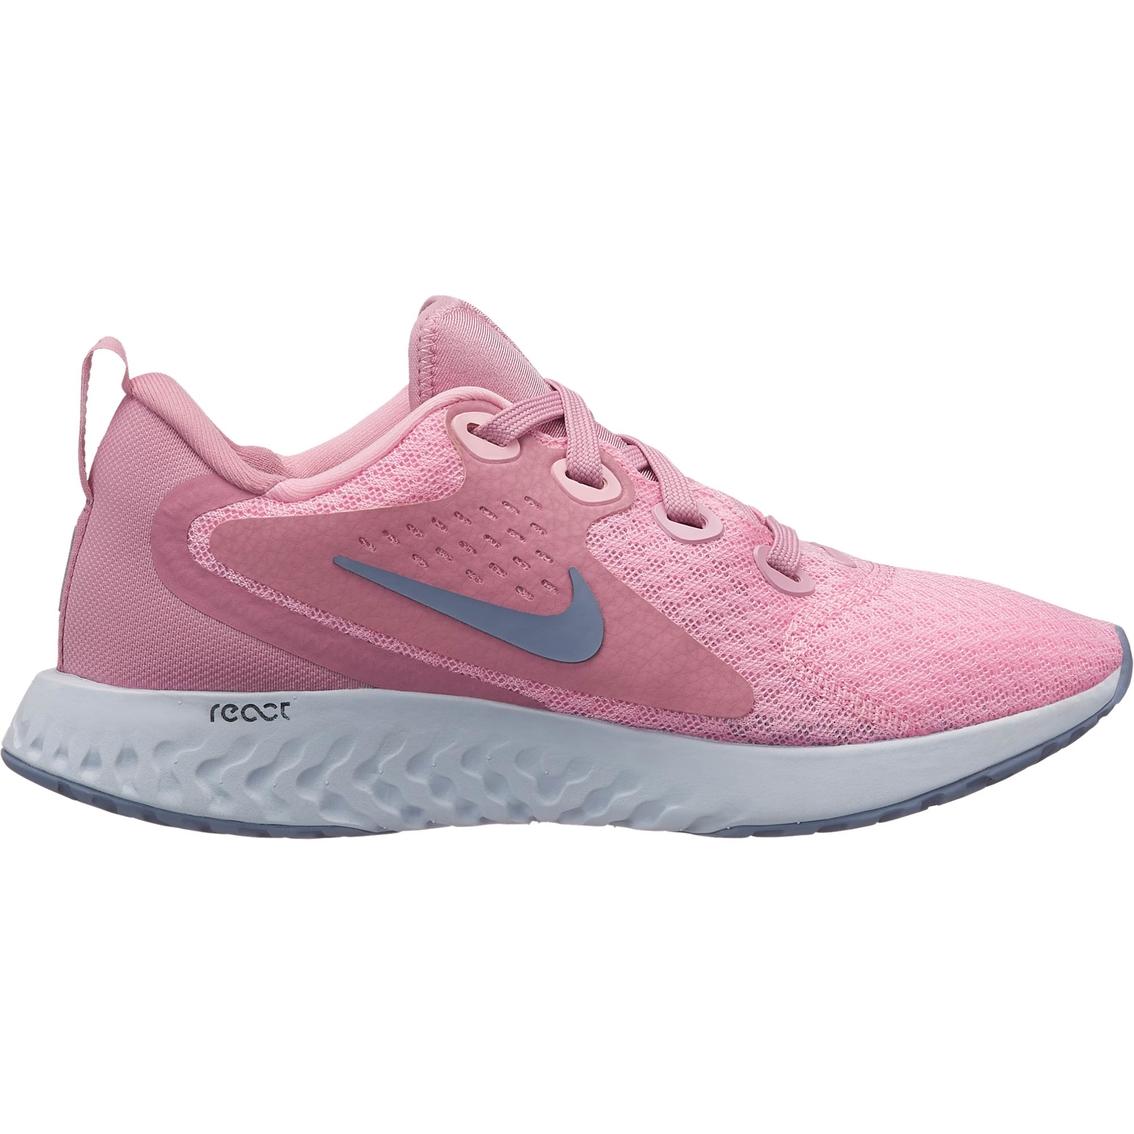 8adbb3ea5111 Nike Grade School Girls Rebel React Running Shoes